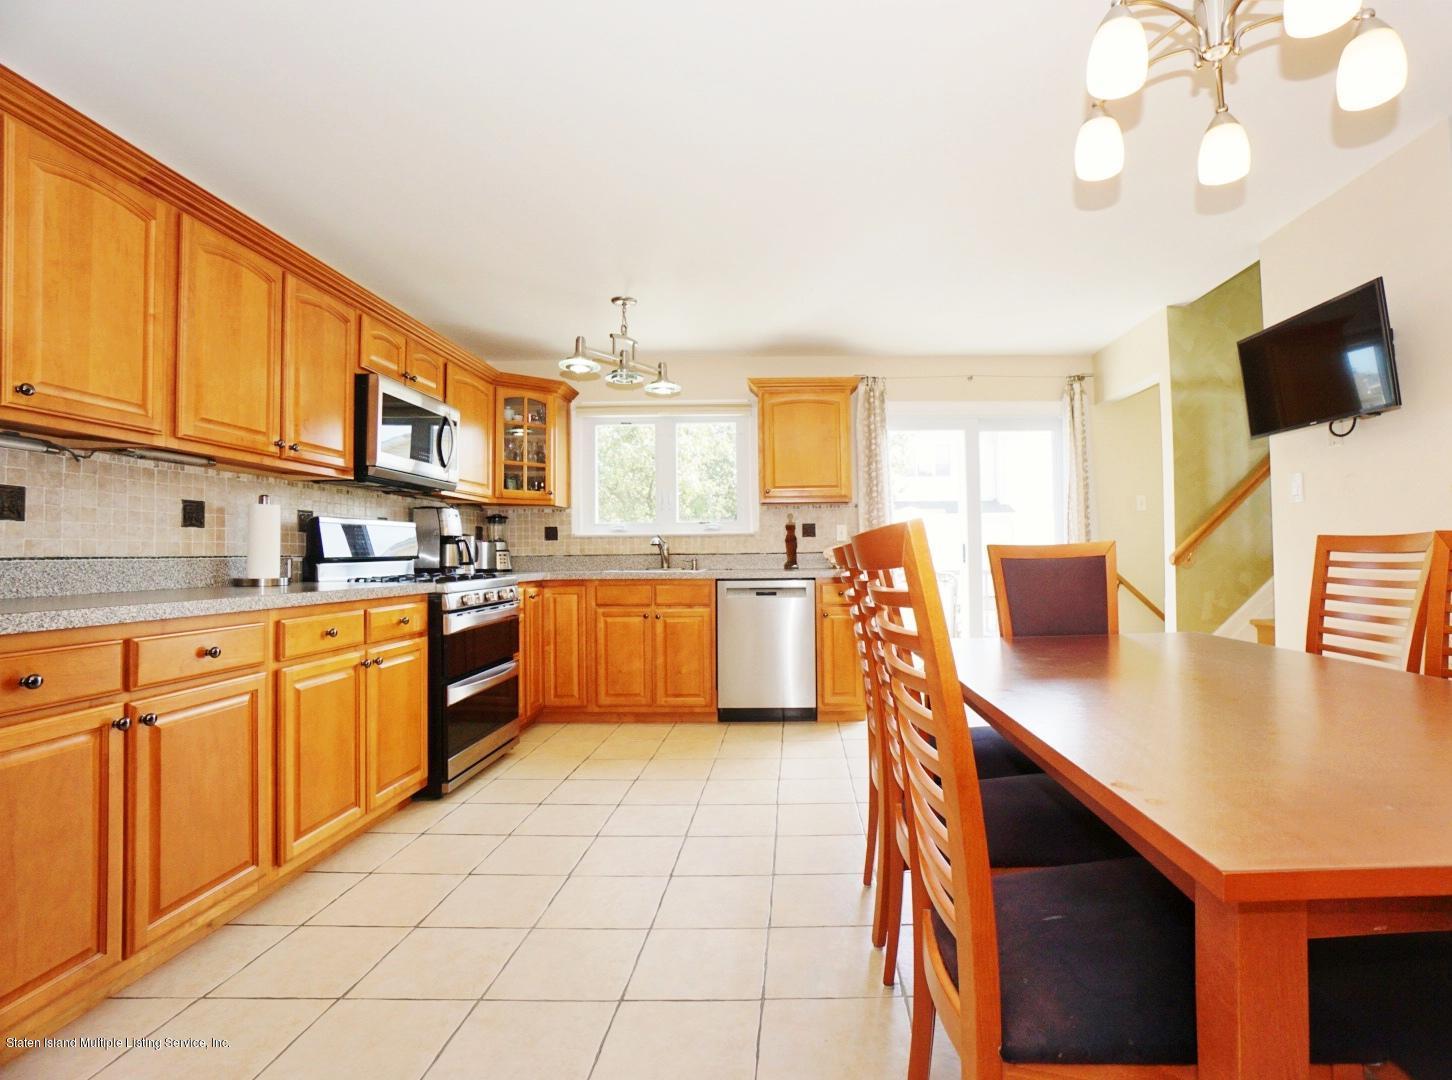 Single Family - Semi-Attached 18 Dunhill Lane  Staten Island, NY 10309, MLS-1139055-10